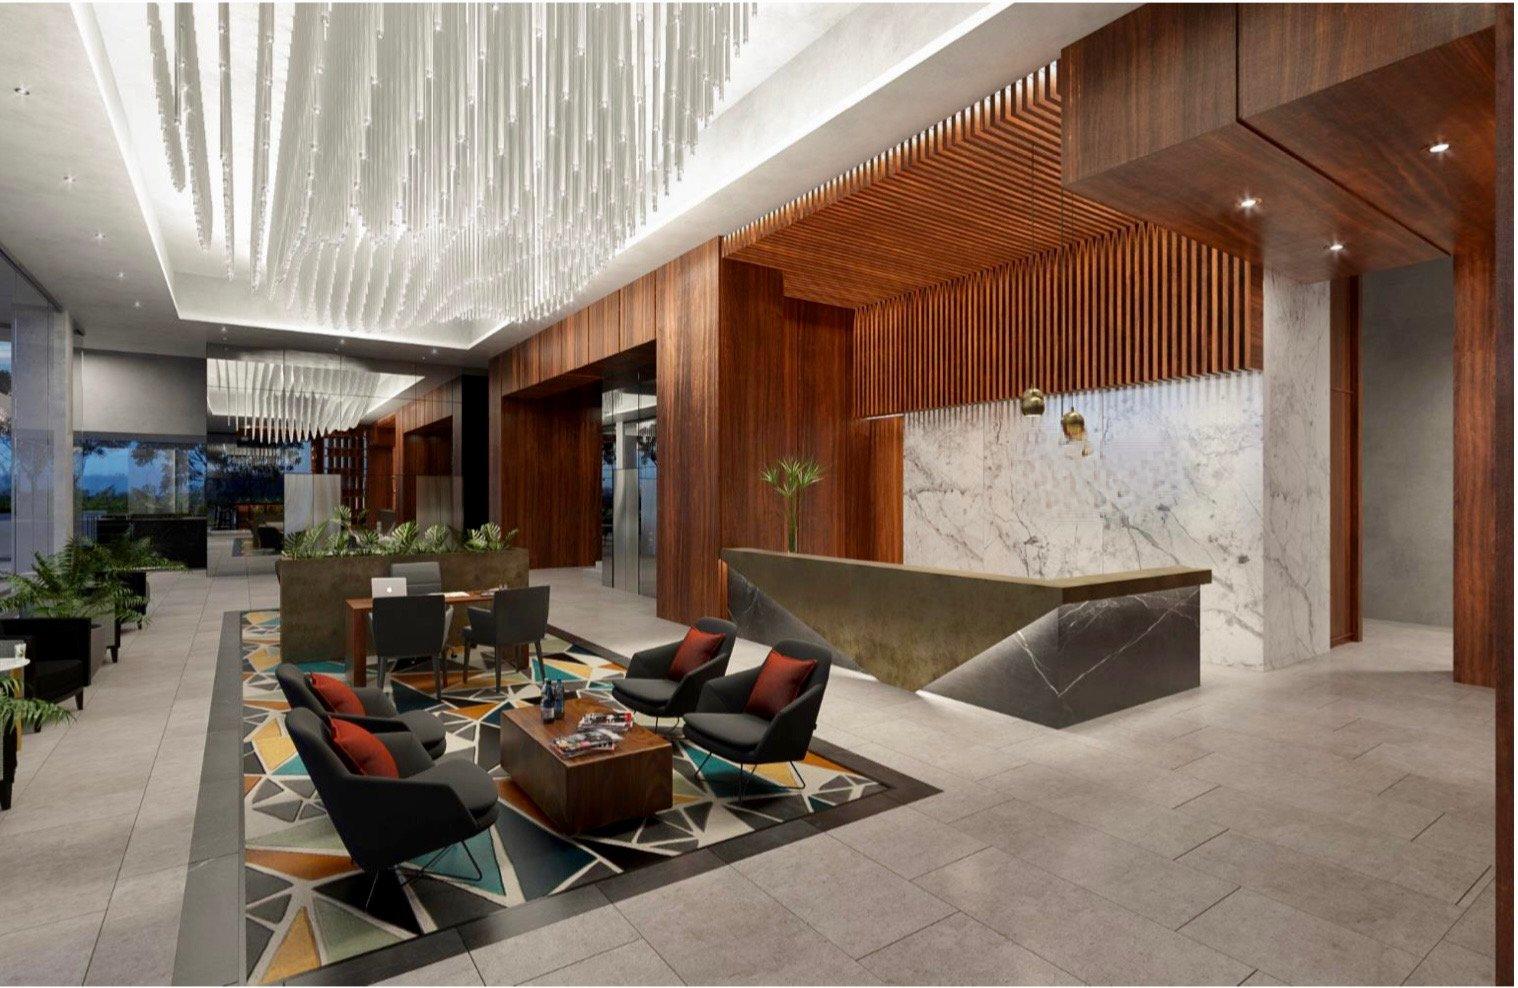 via-montejo-hotel-lobby-inversion-2020